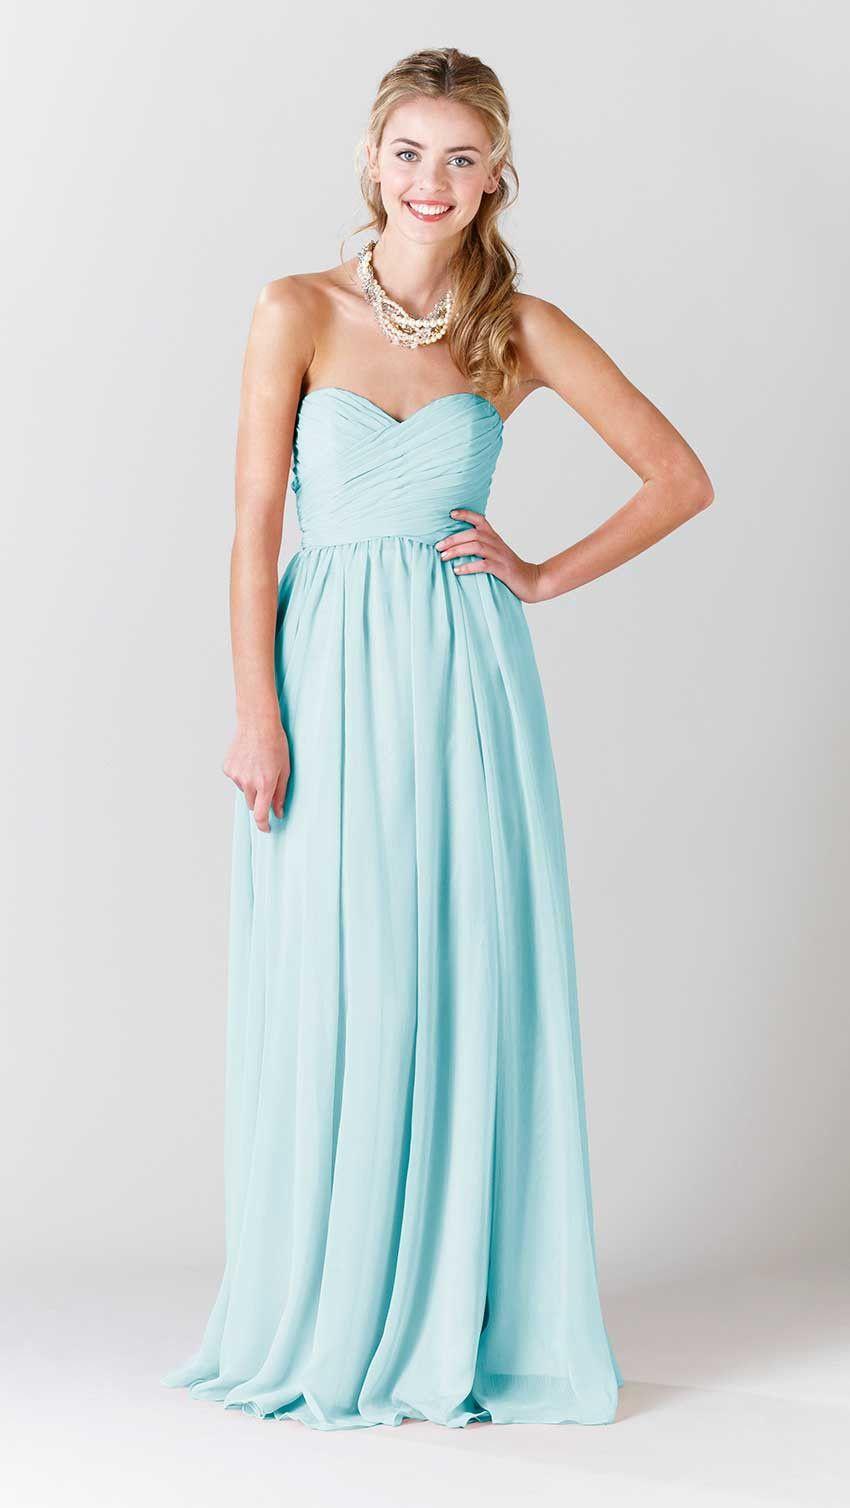 Olivia chiffon fabric chiffon bridesmaid dresses and bodice